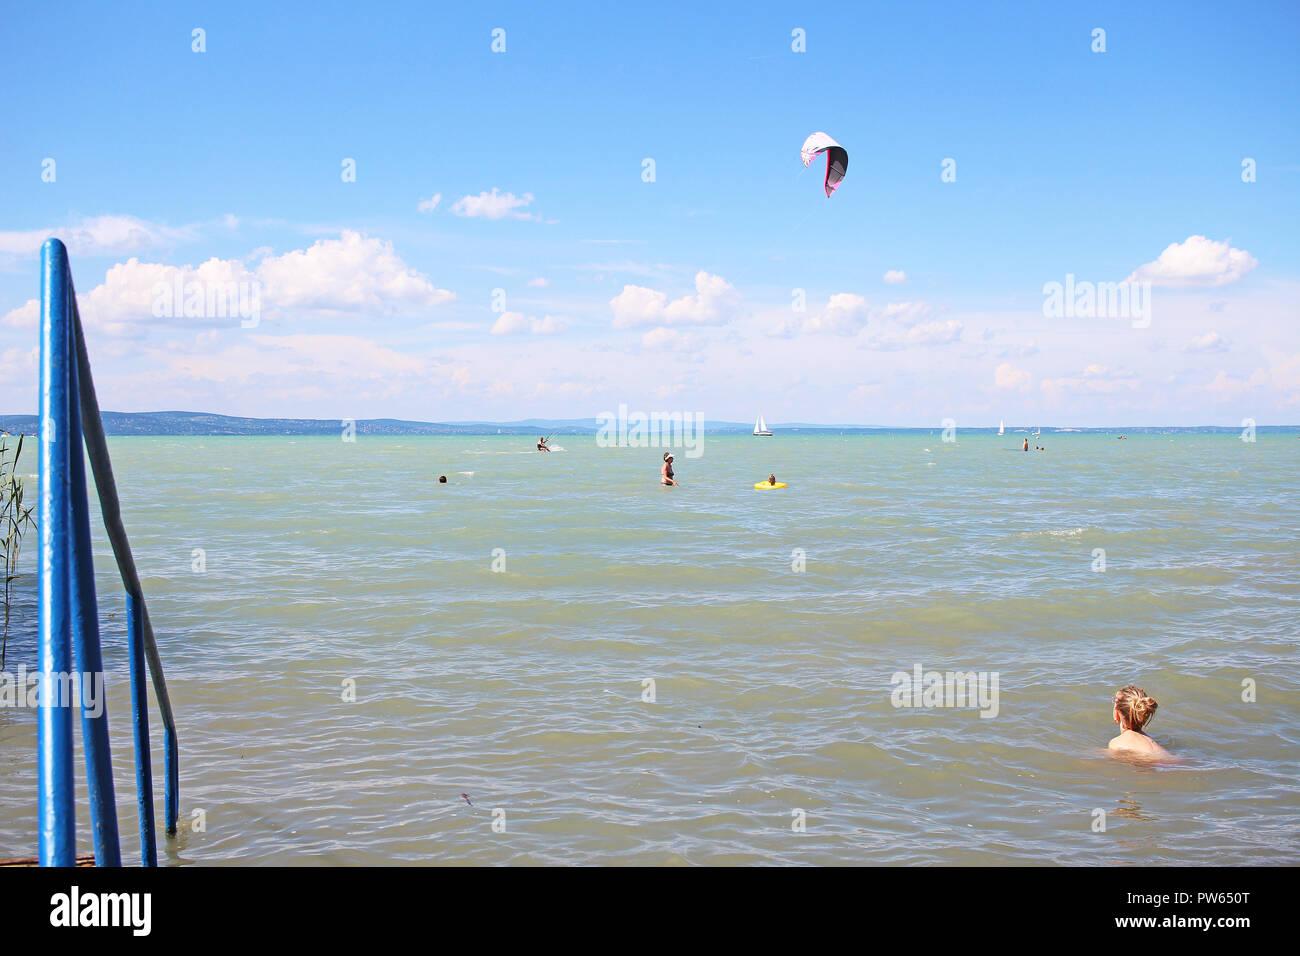 Balaton lake Hungary summer 2018 Europe. Sunny hot day near water. - Stock Image